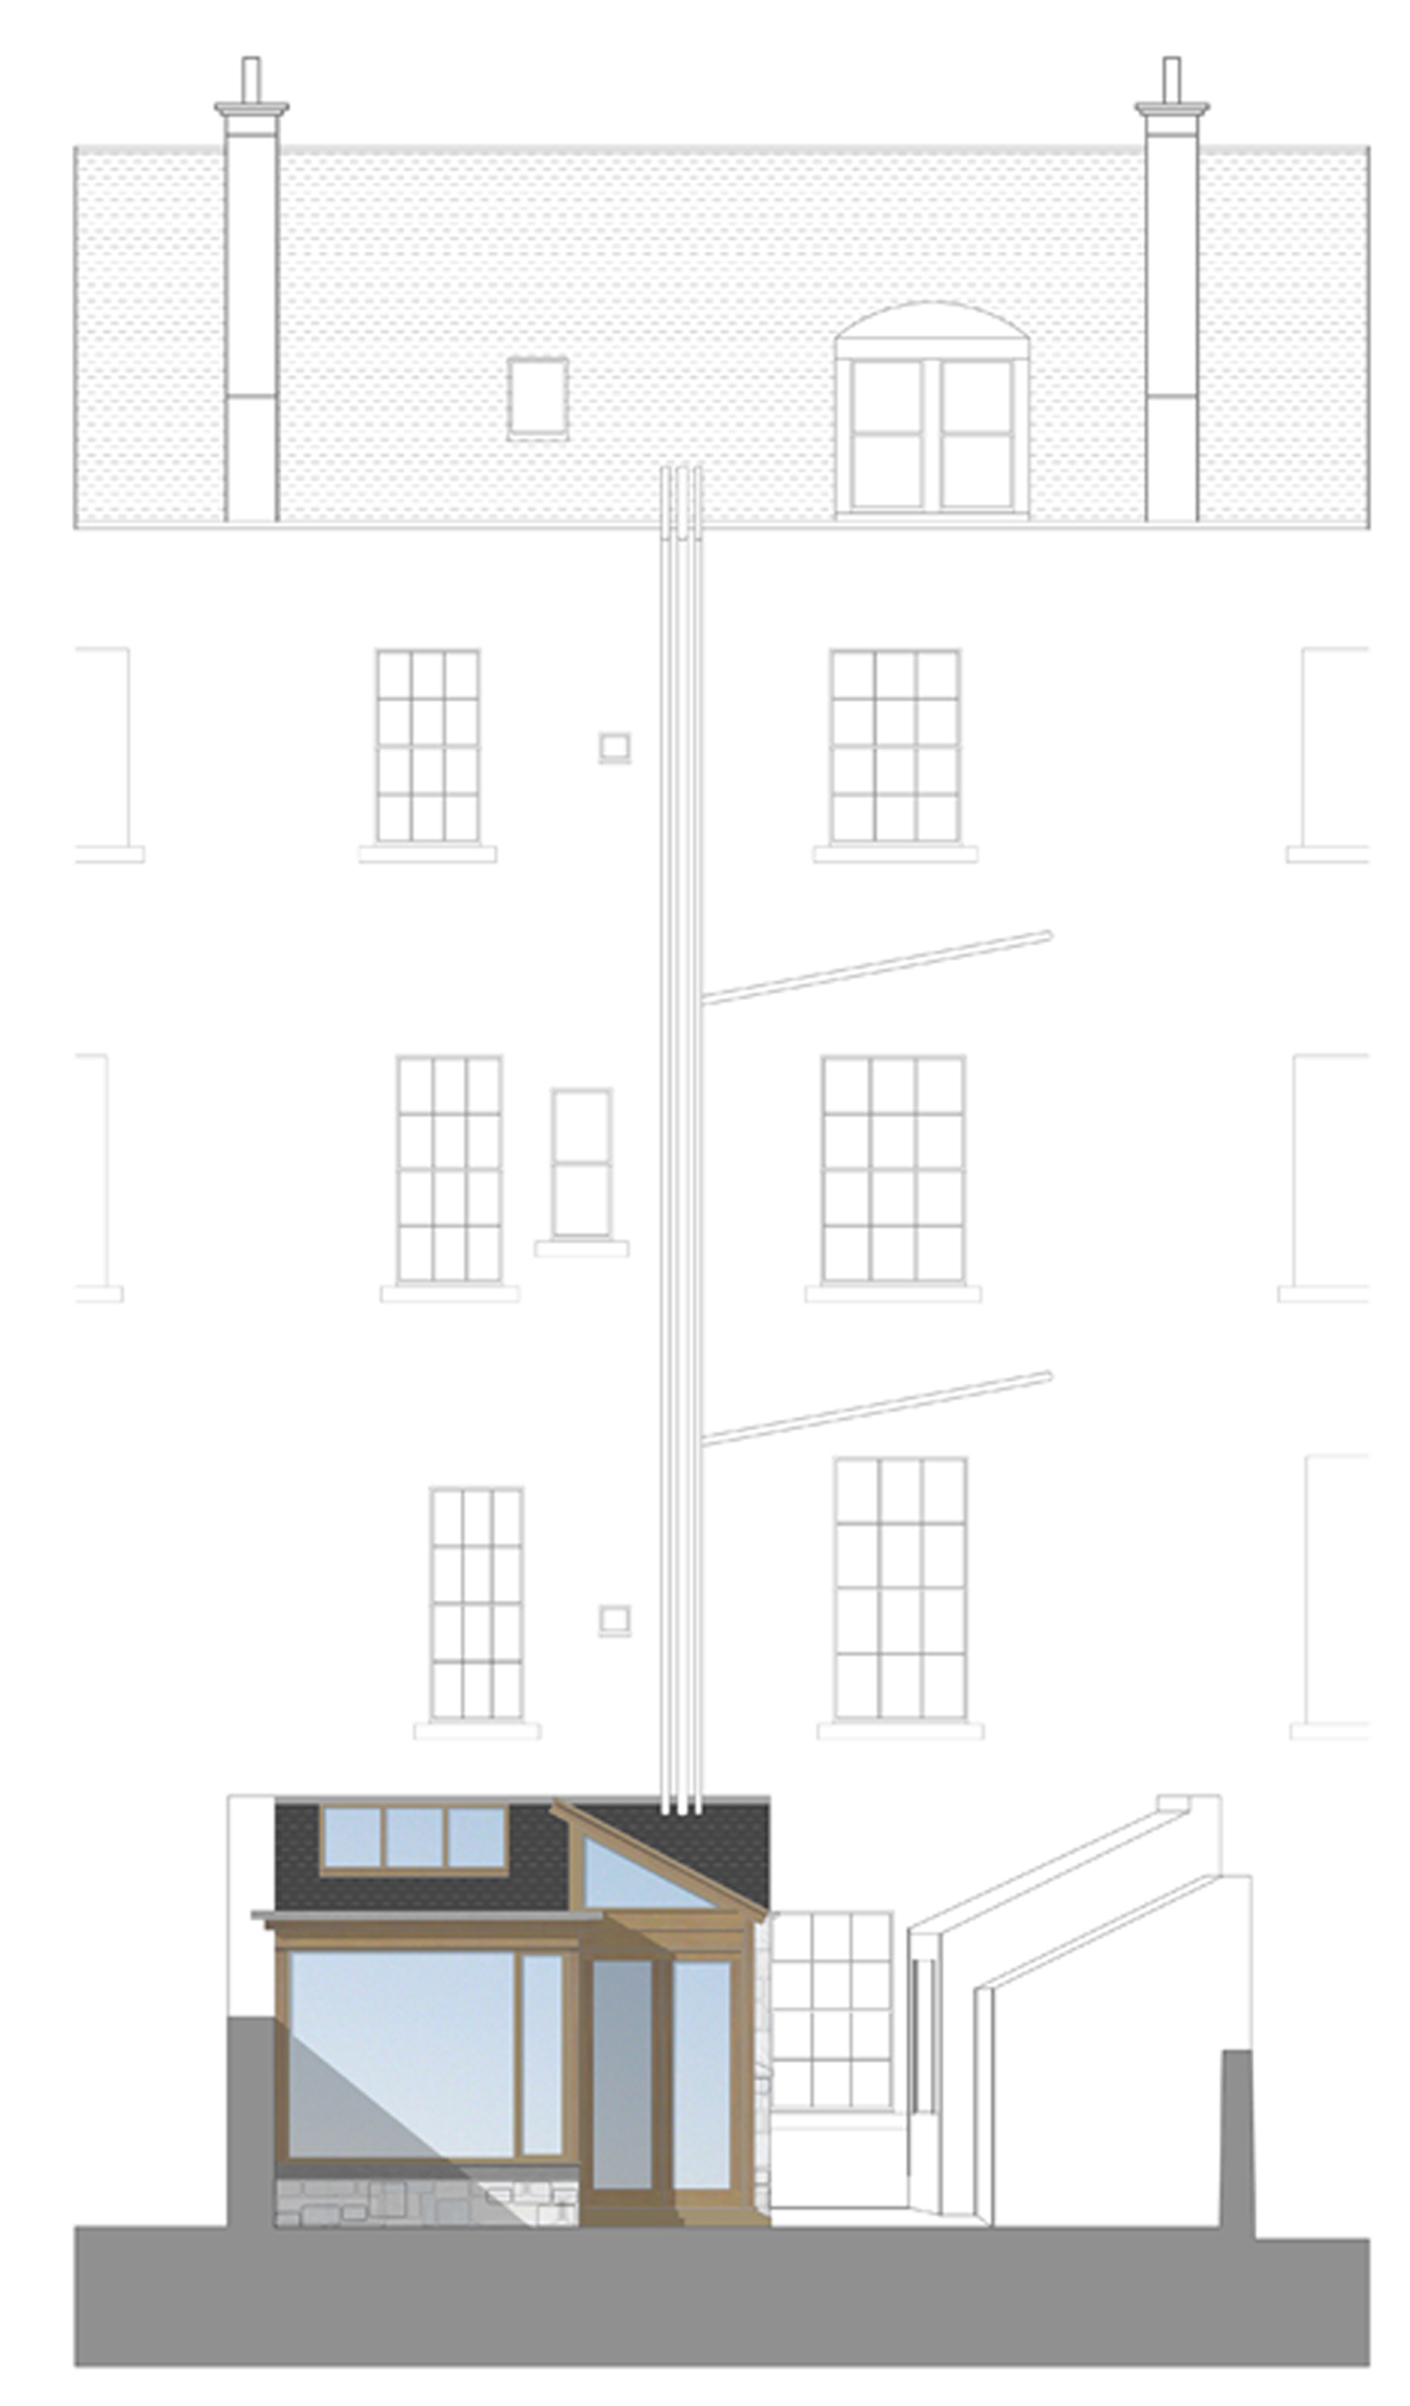 David Blaikie Architects_Clarendon Crescent Elevation